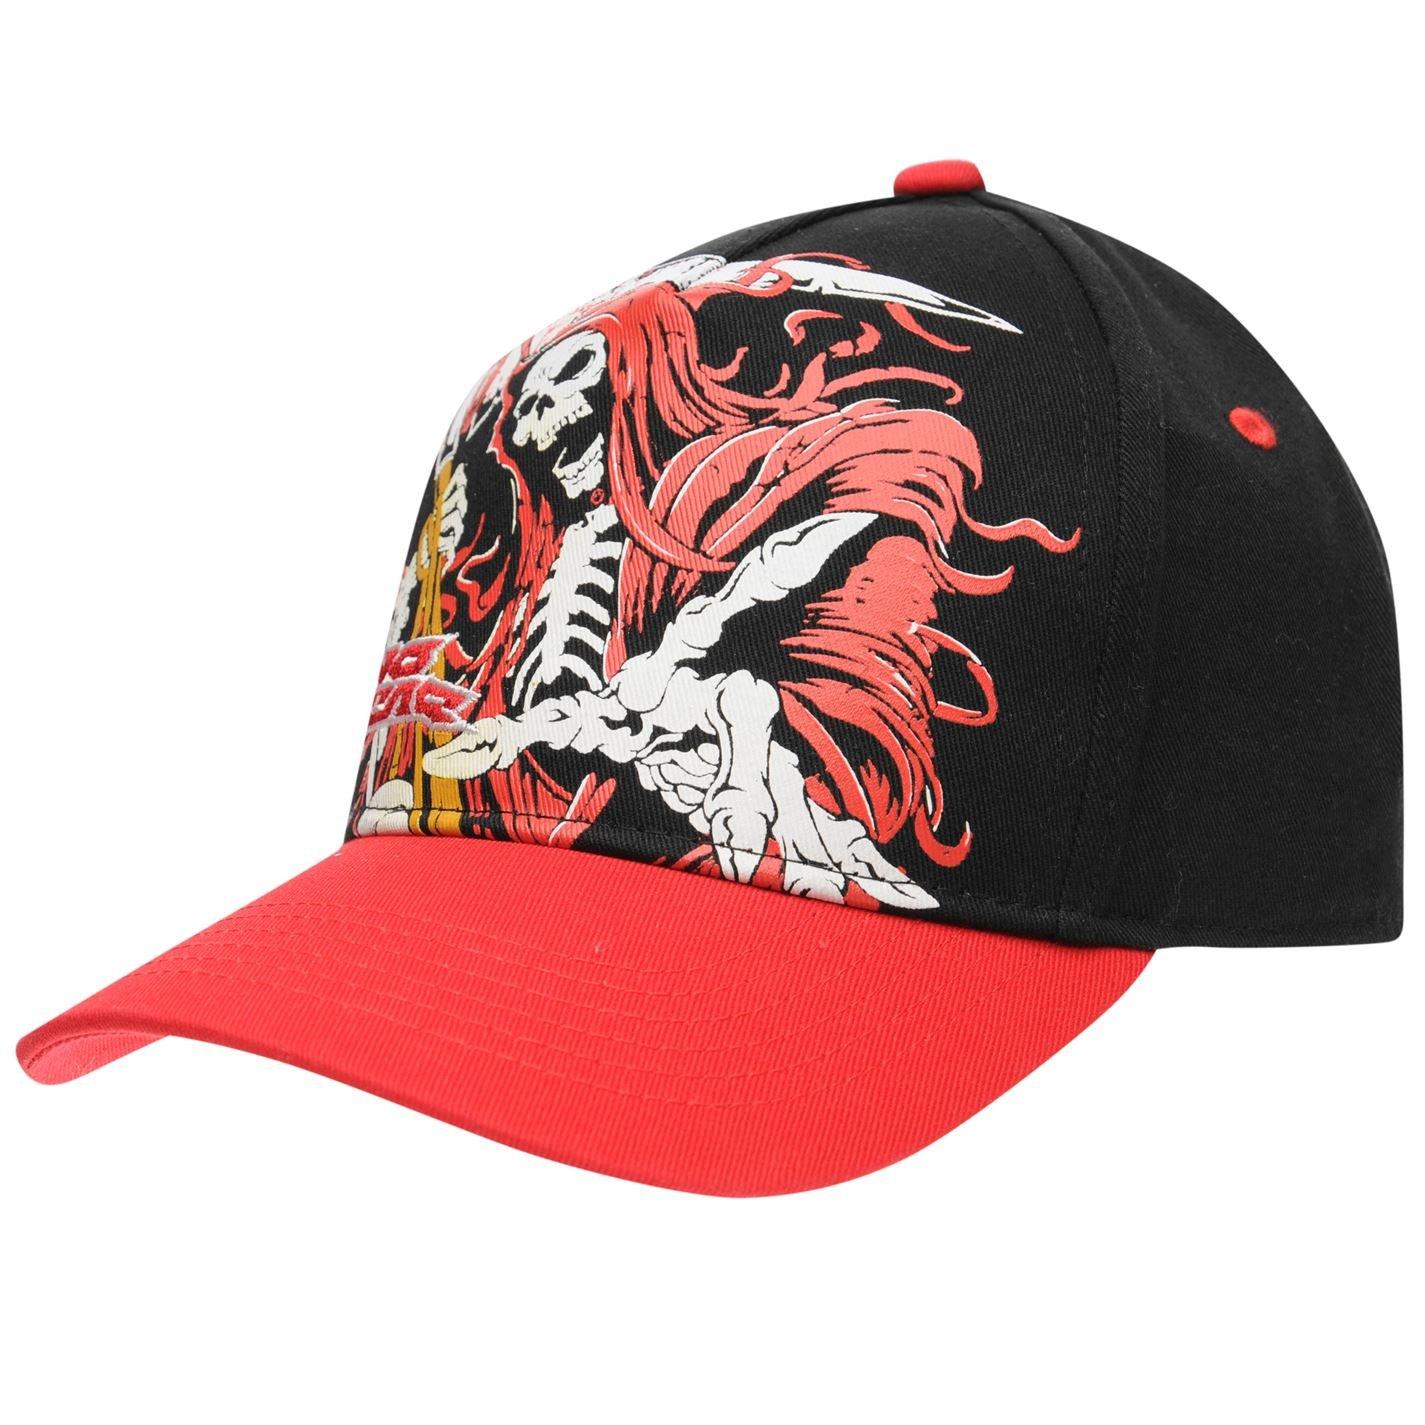 No Fear Kids Baseball Cap Black Red Junior  Amazon.co.uk  Clothing 526d52fcb0b